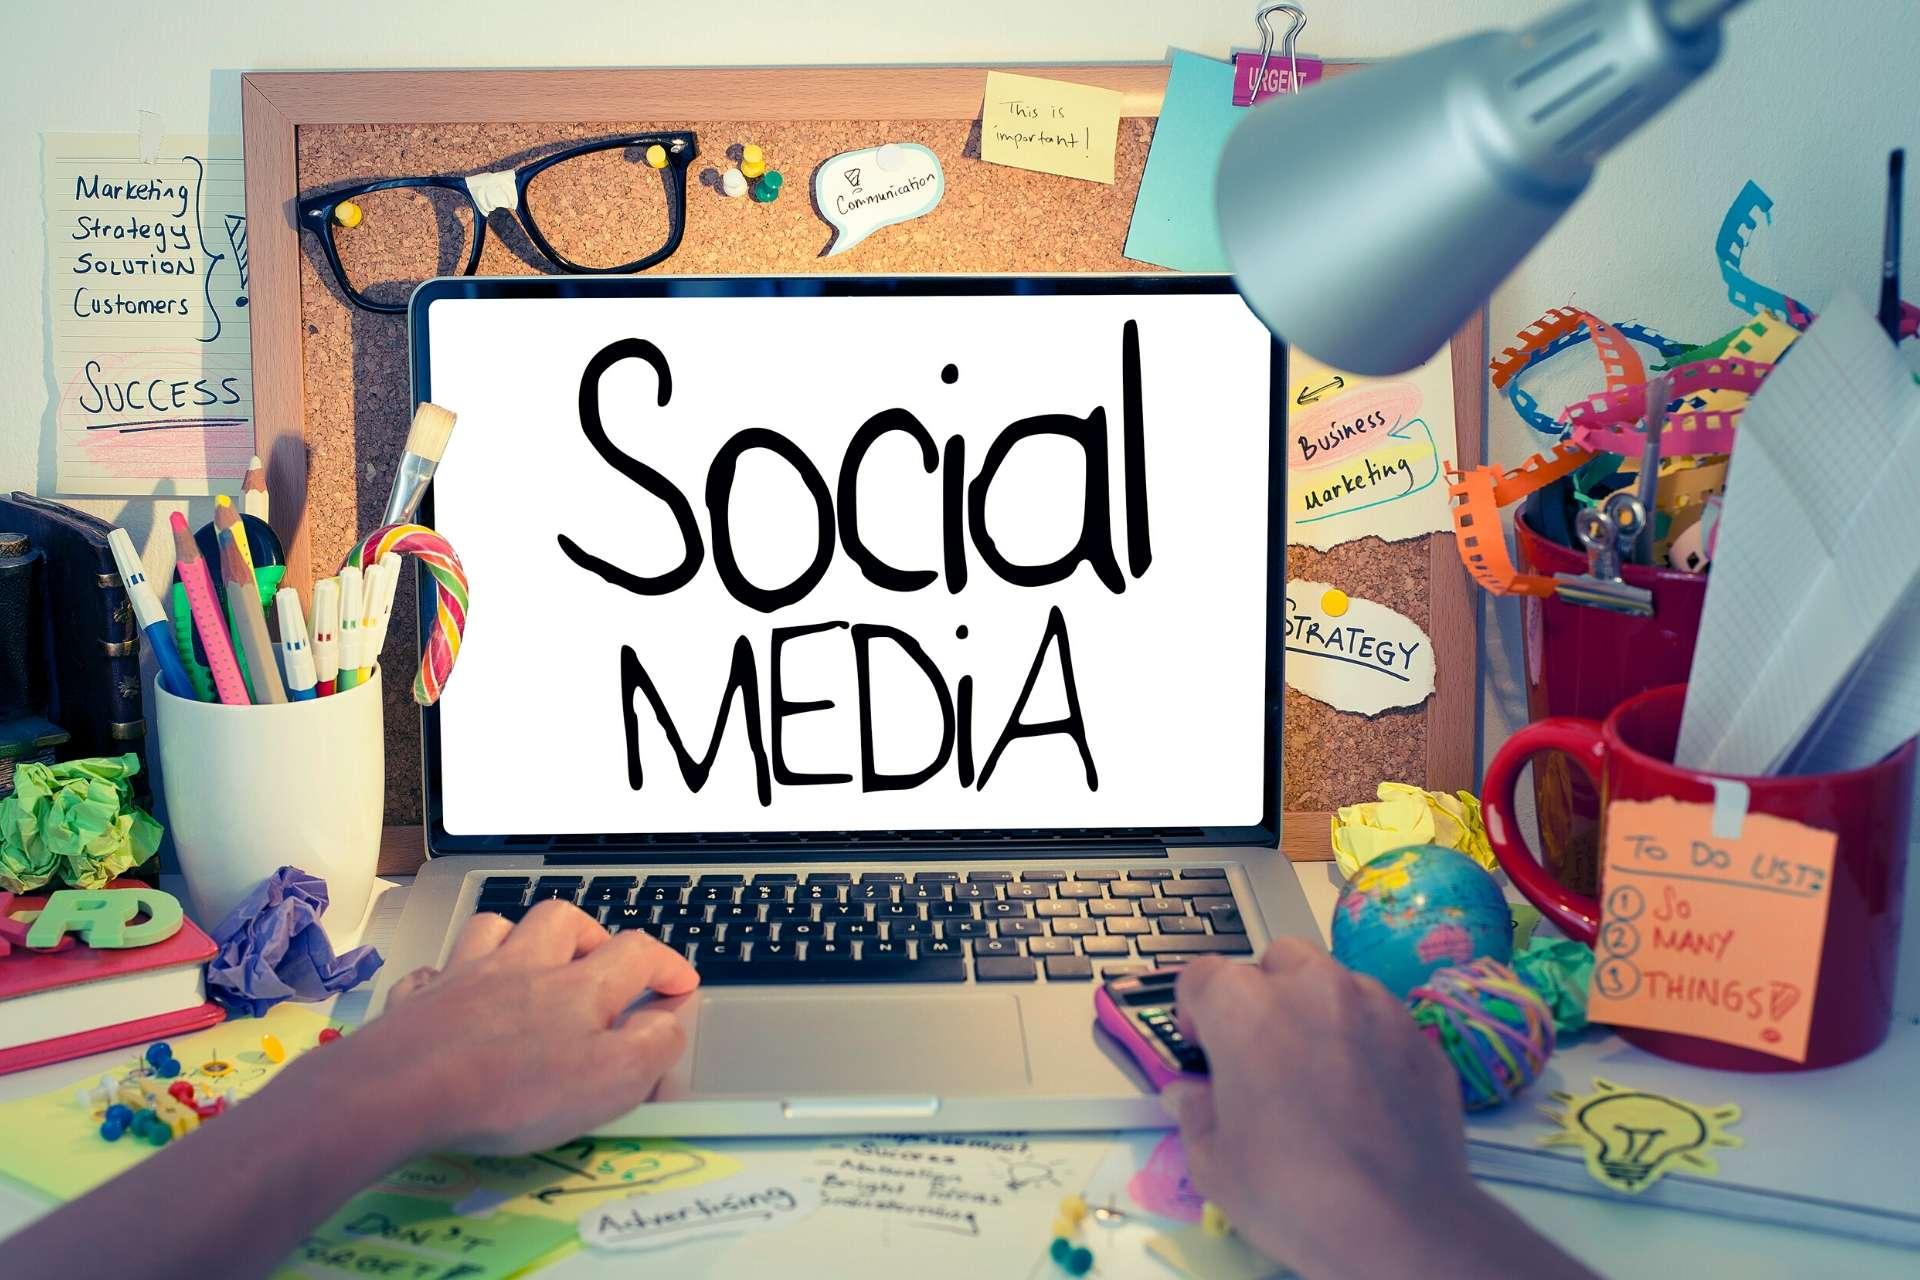 social media Cyprus marketing courses